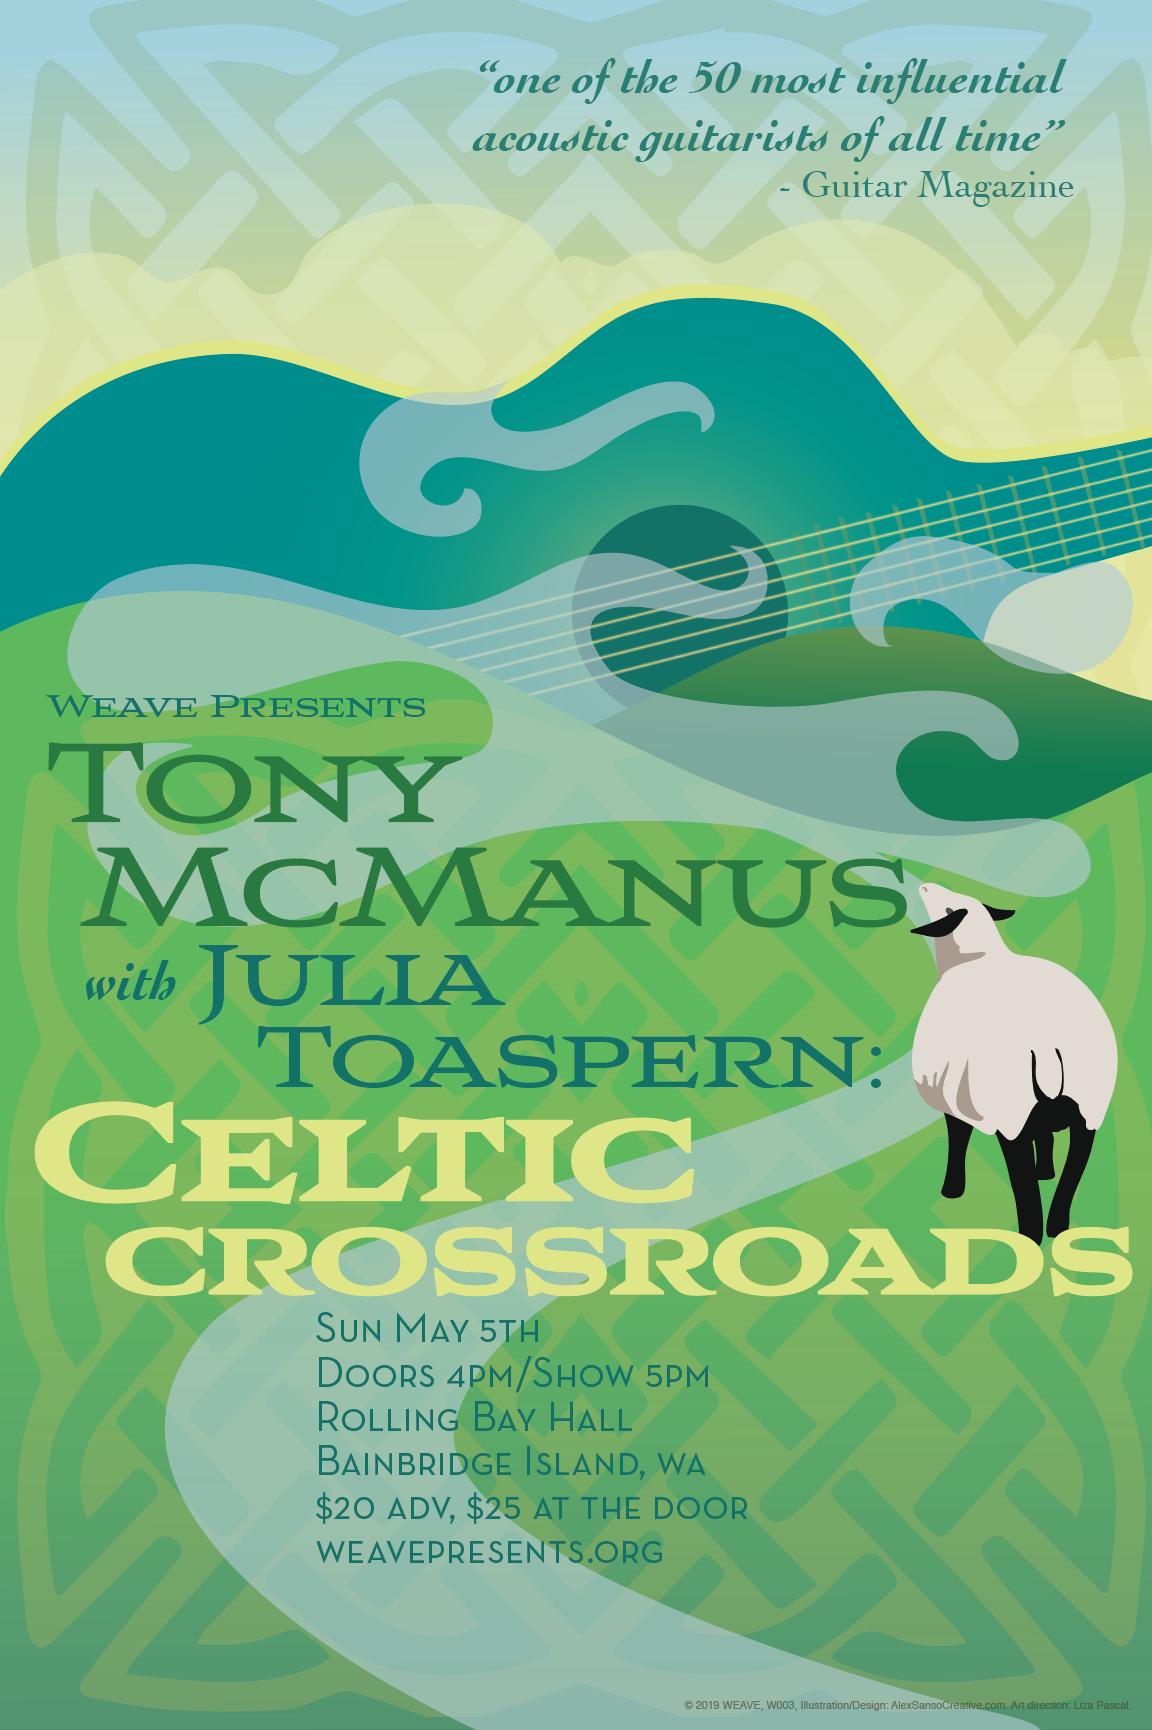 Celtic Crossroads concert poster